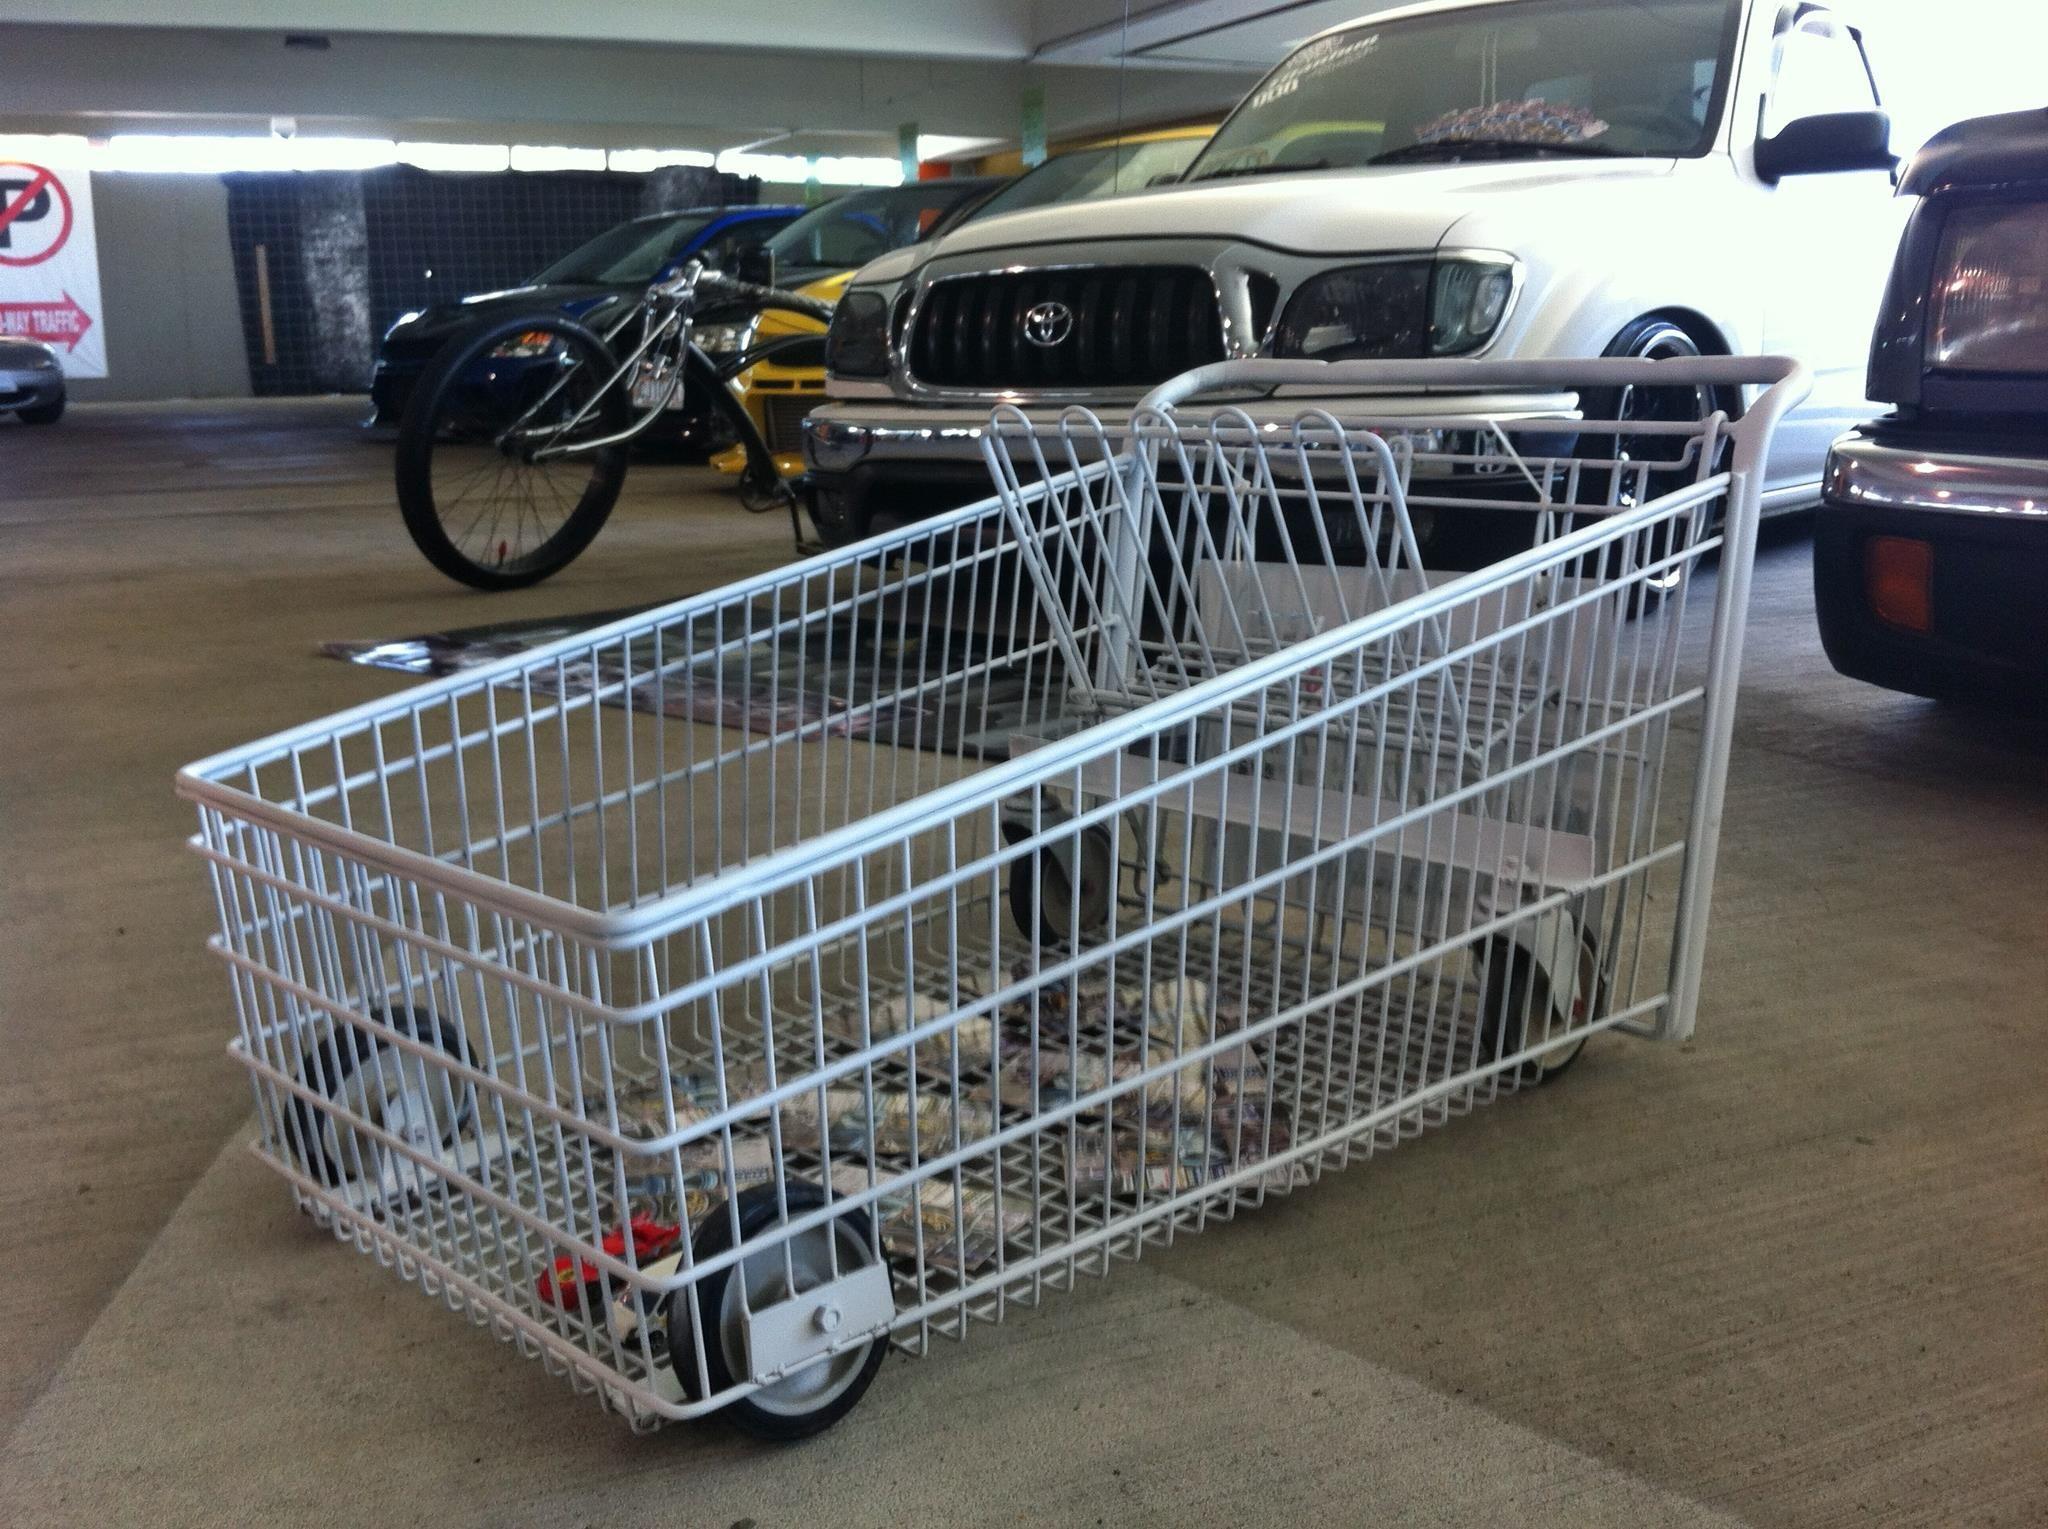 Slammed Shopping Cart Swag Hahaha Go Kart Cycle Car Wagons